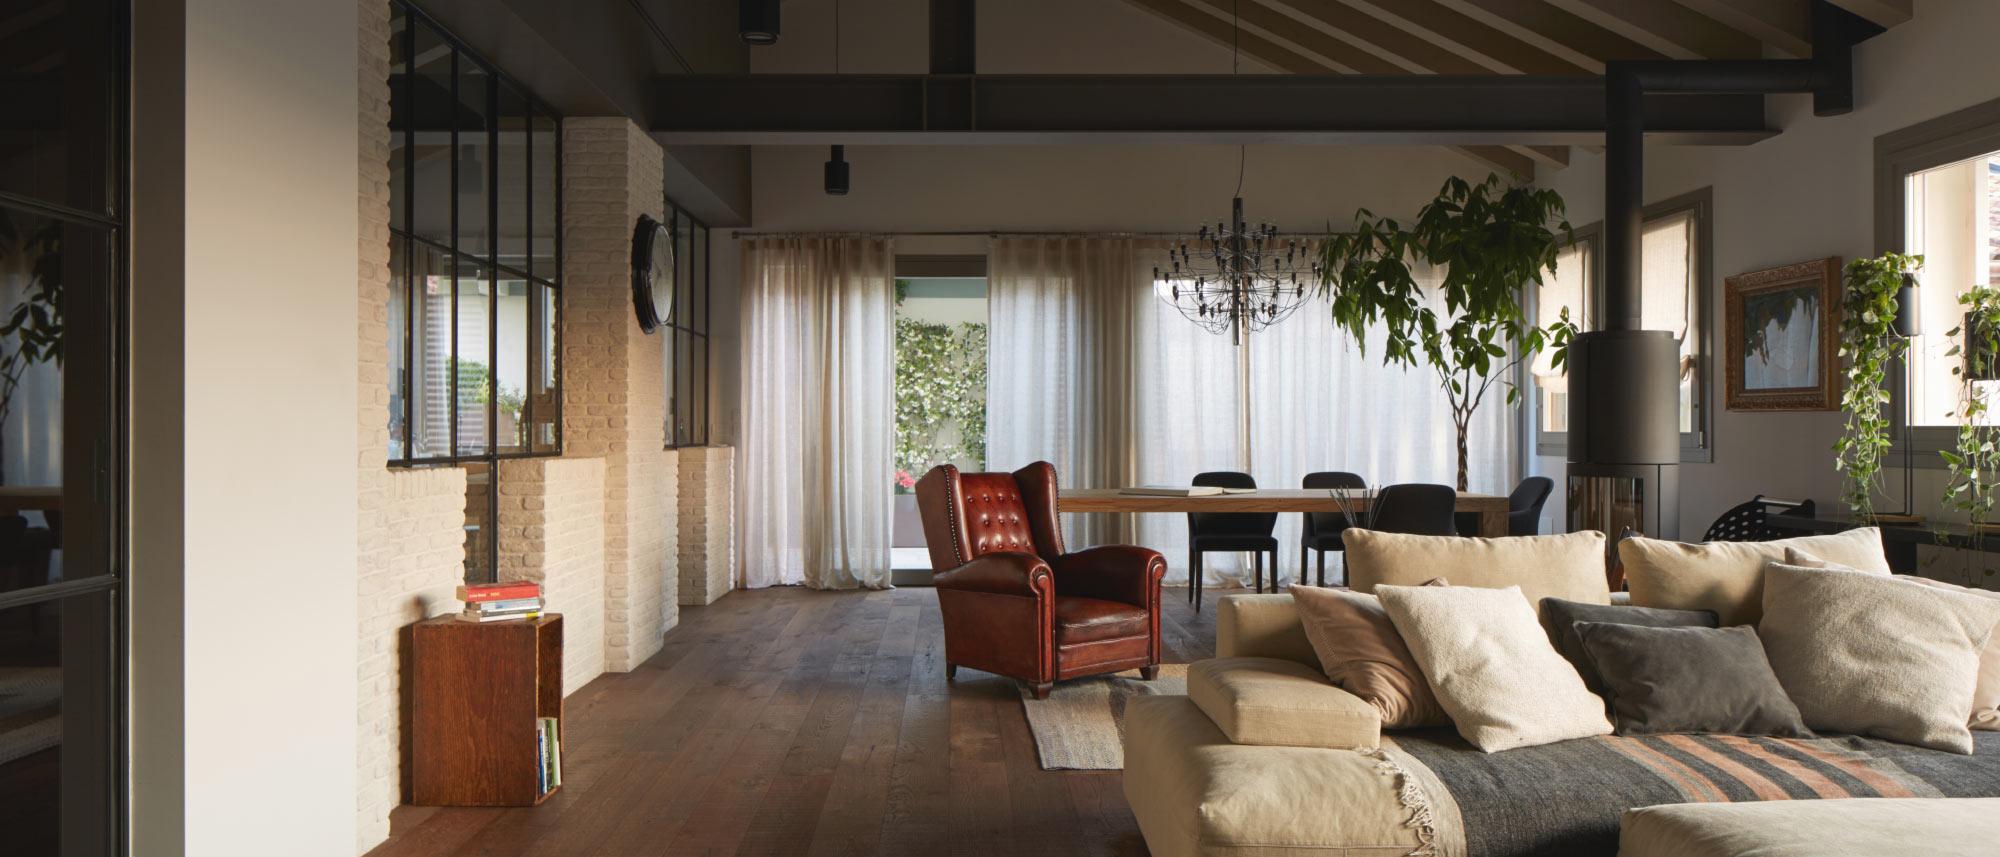 aceti_appartamento_castelfranco_49